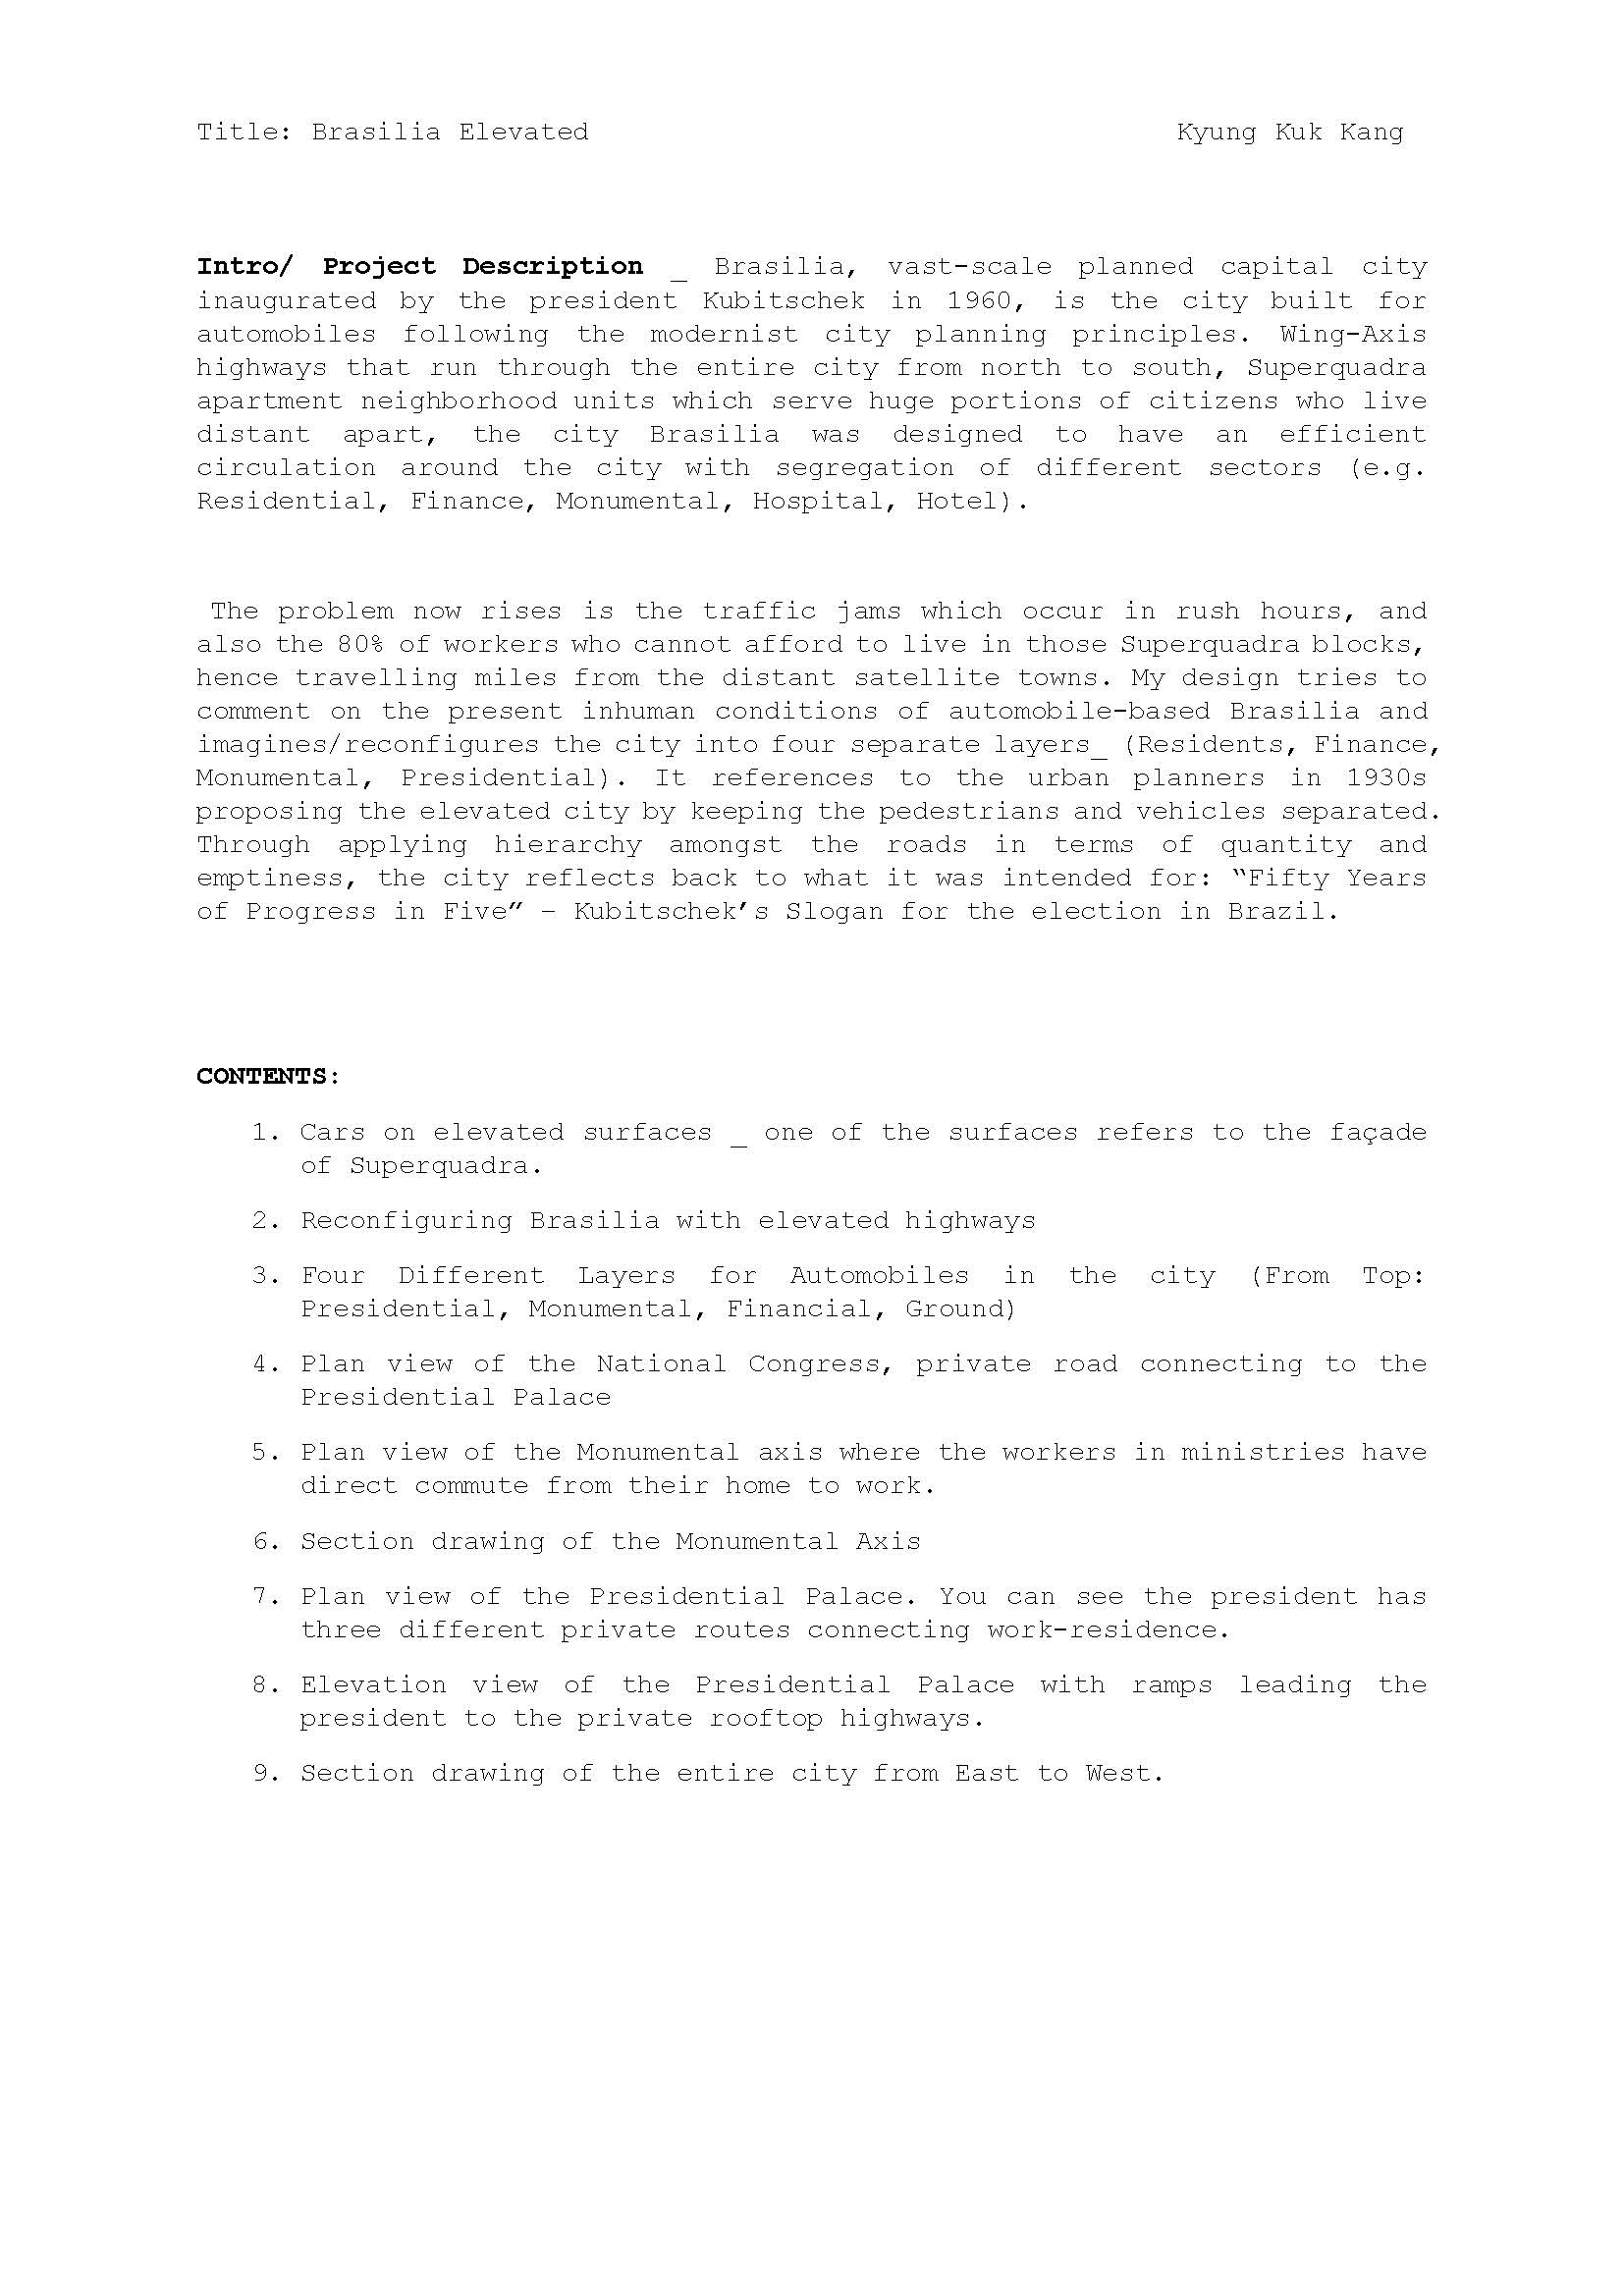 project-description_kyung-kuk-kang.jpg